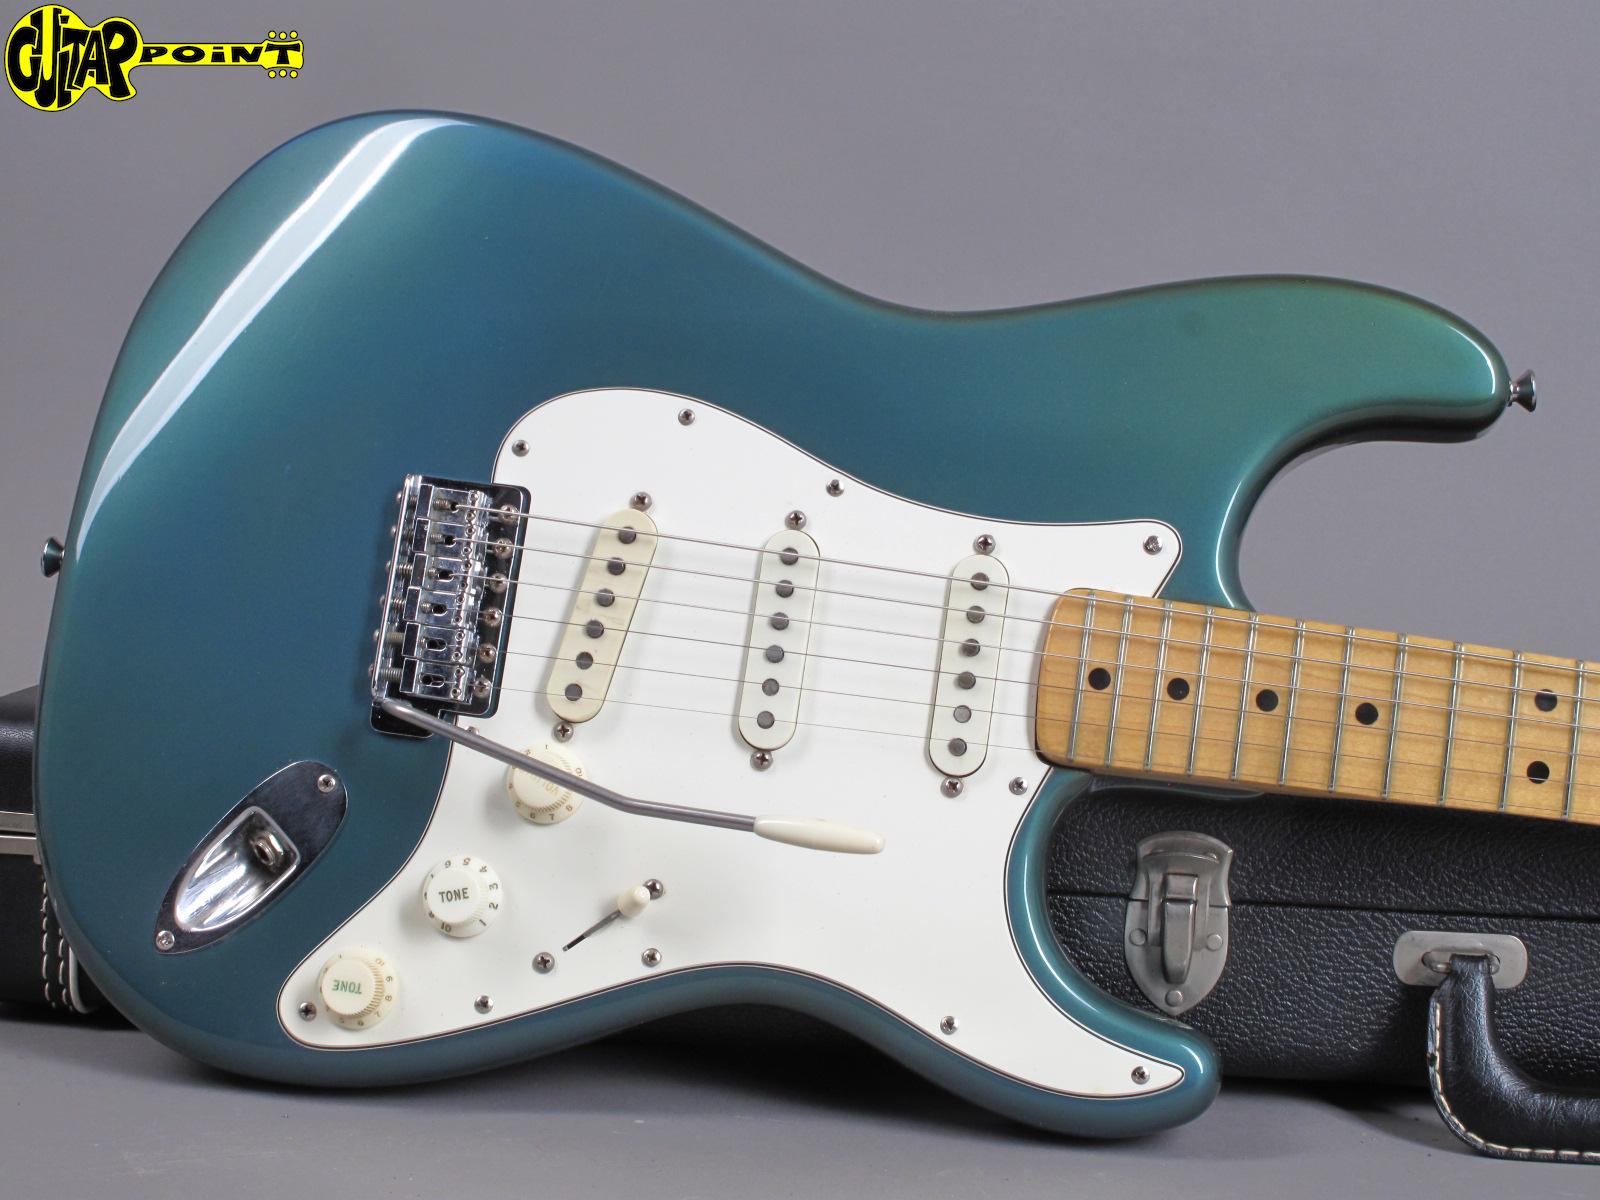 https://guitarpoint.de/app/uploads/products/1974-fender-stratocaster-lake-placid-blue/Fender1974StrLPB526895_11.jpg